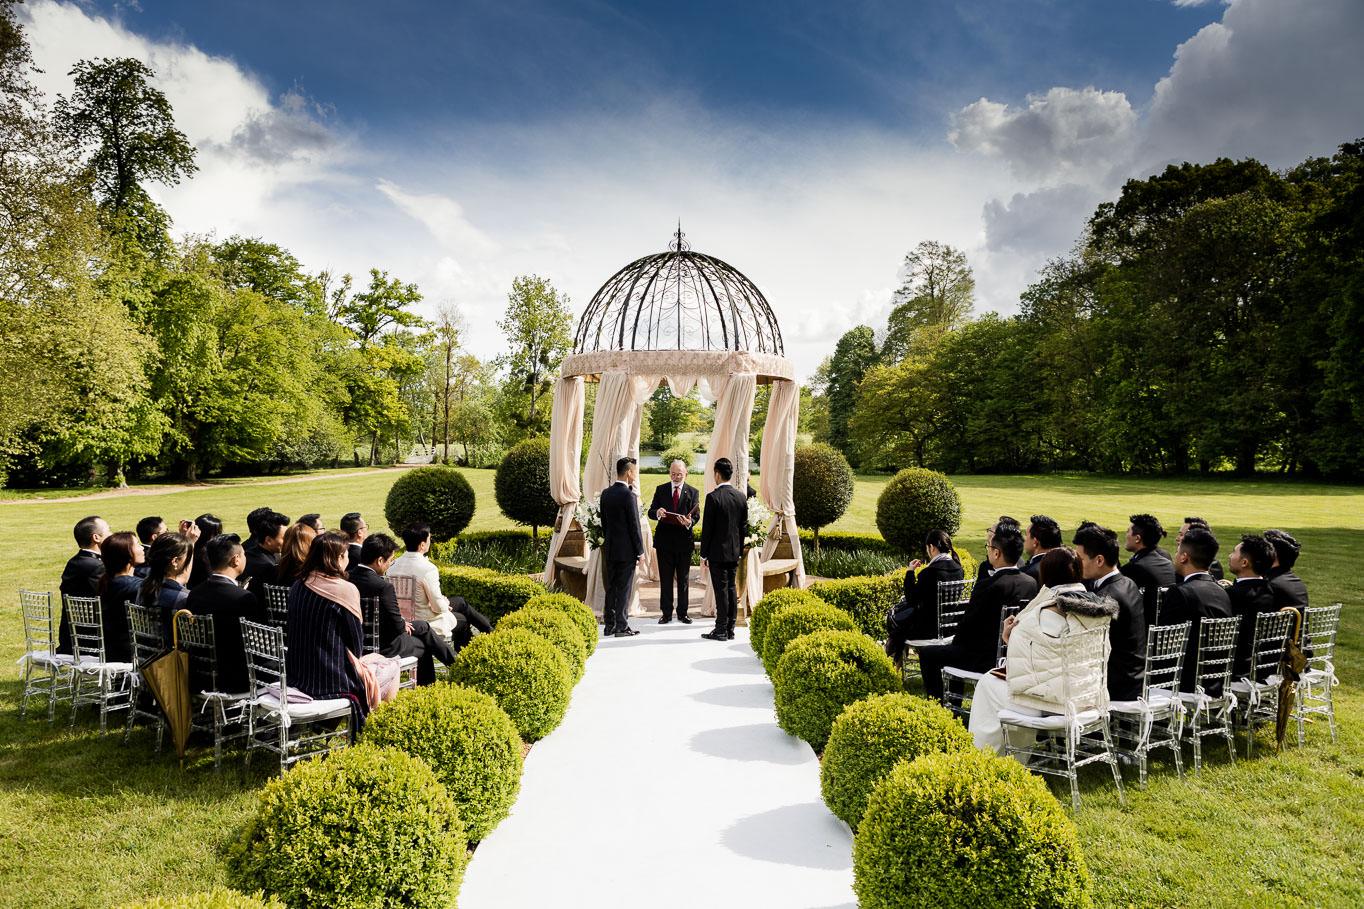 ceremony same sex wedding